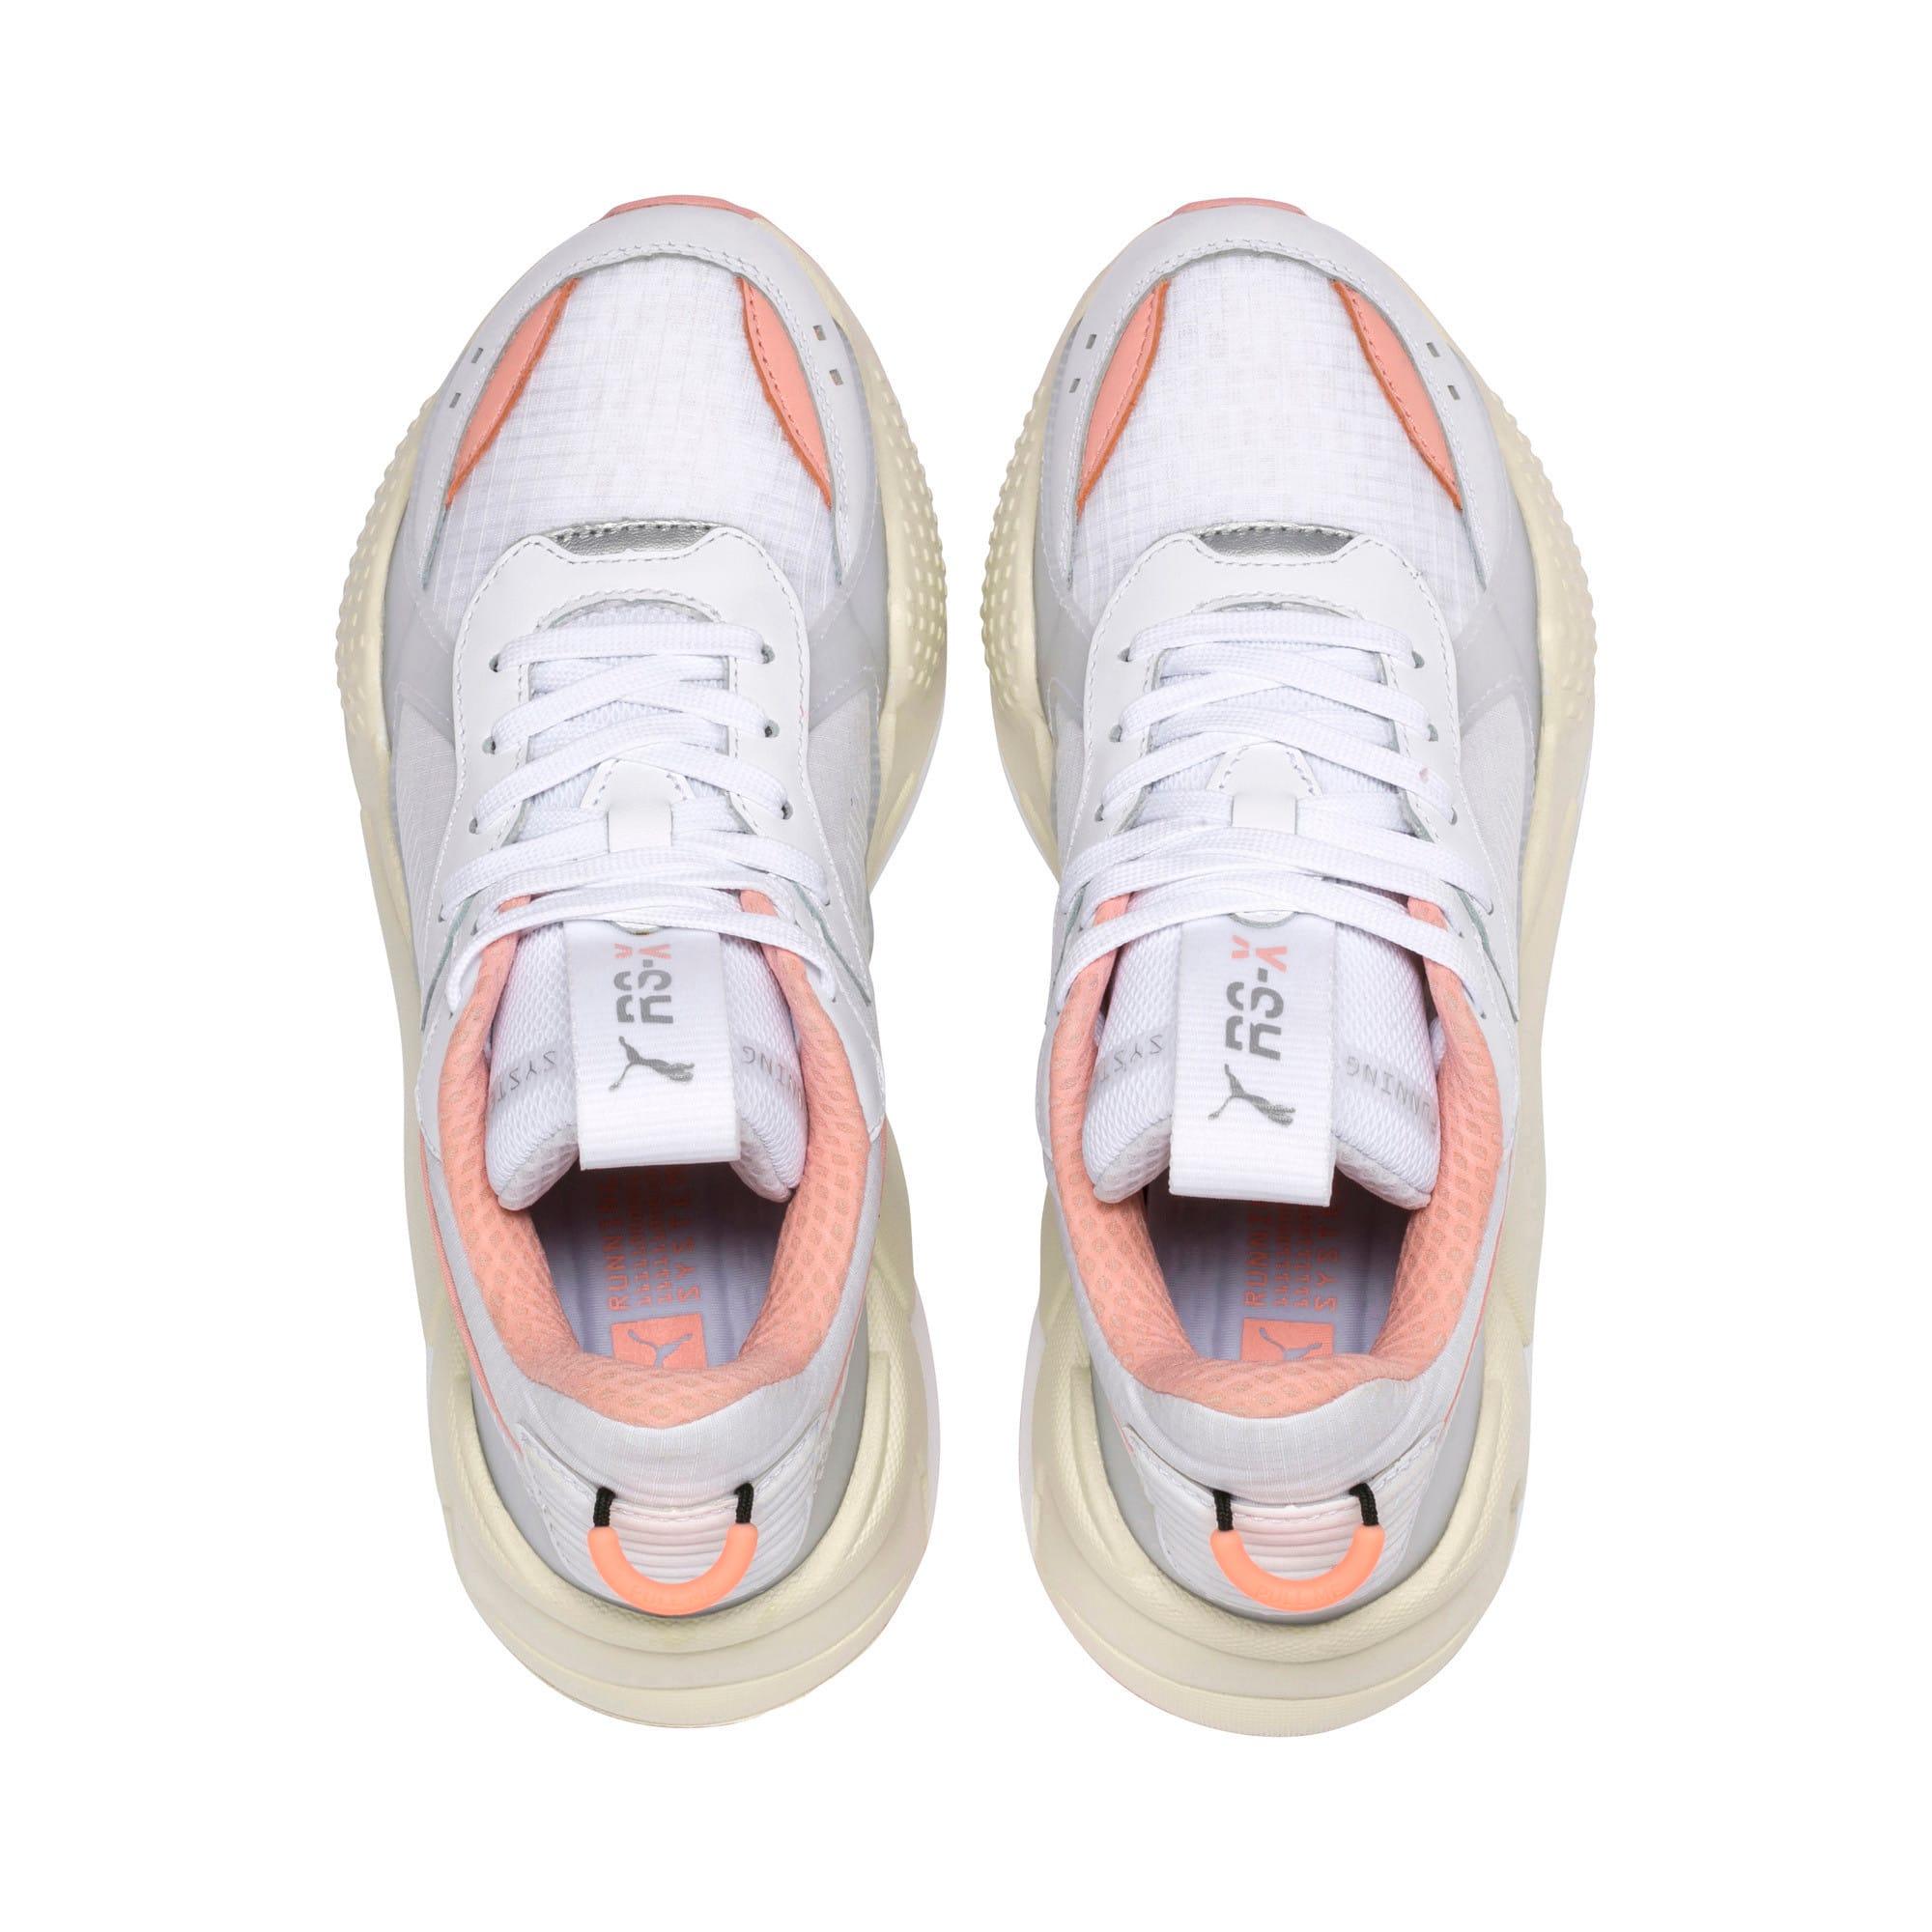 Thumbnail 6 of RS-X Tech Women's Sneakers, Puma White-Peach Bud, medium